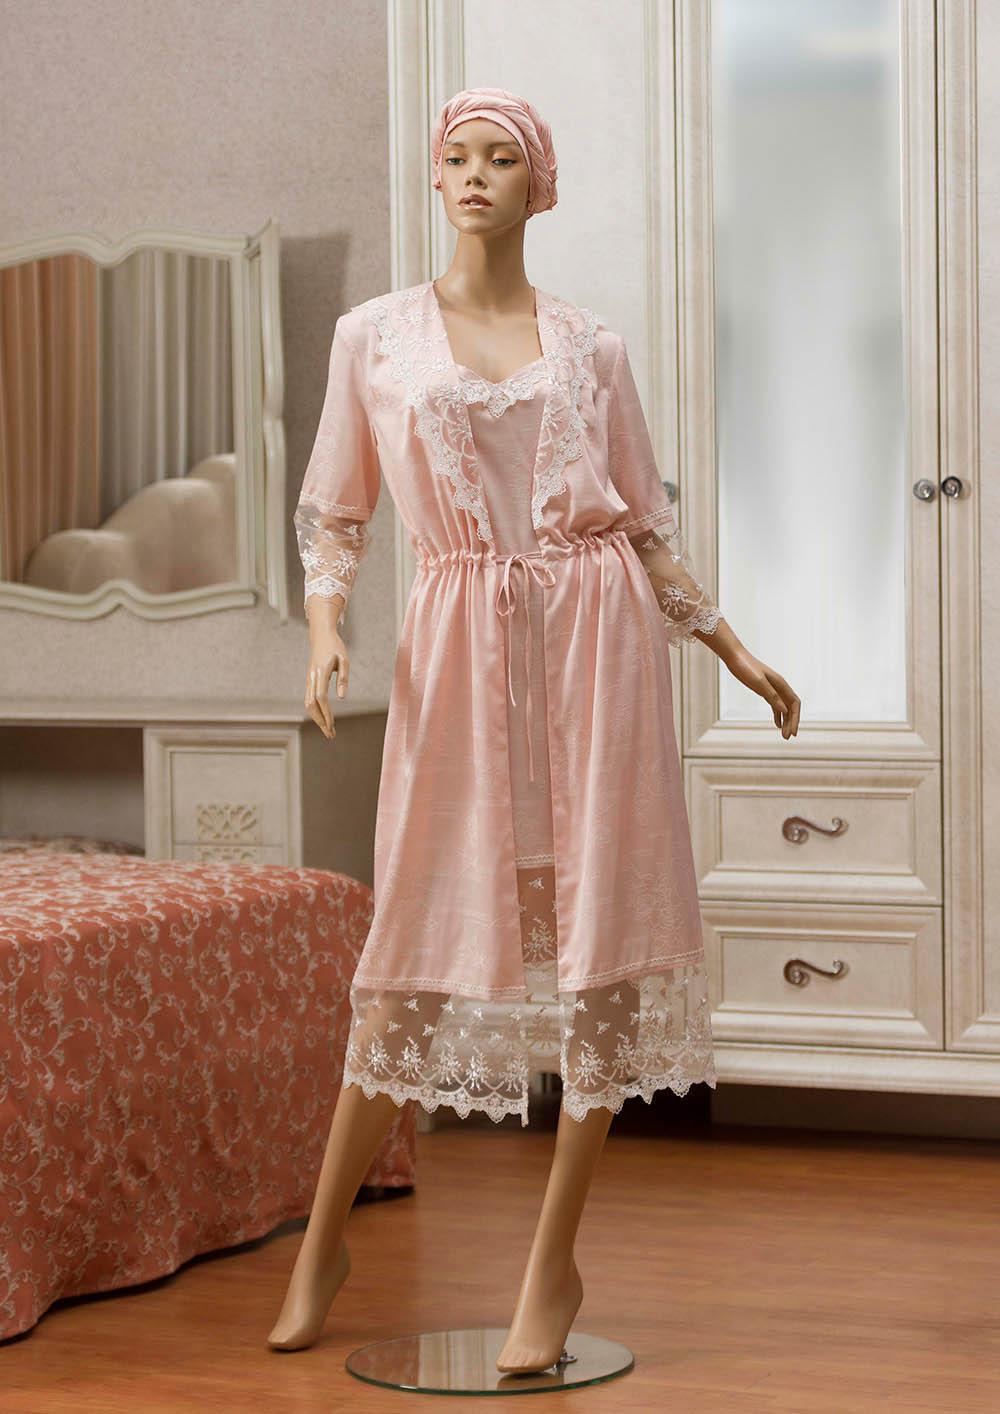 Домашние халаты Primavelle Домашний халат Lavole Цвет: Розовый (M) домашние халаты mia mia домашний халат yesenia xl